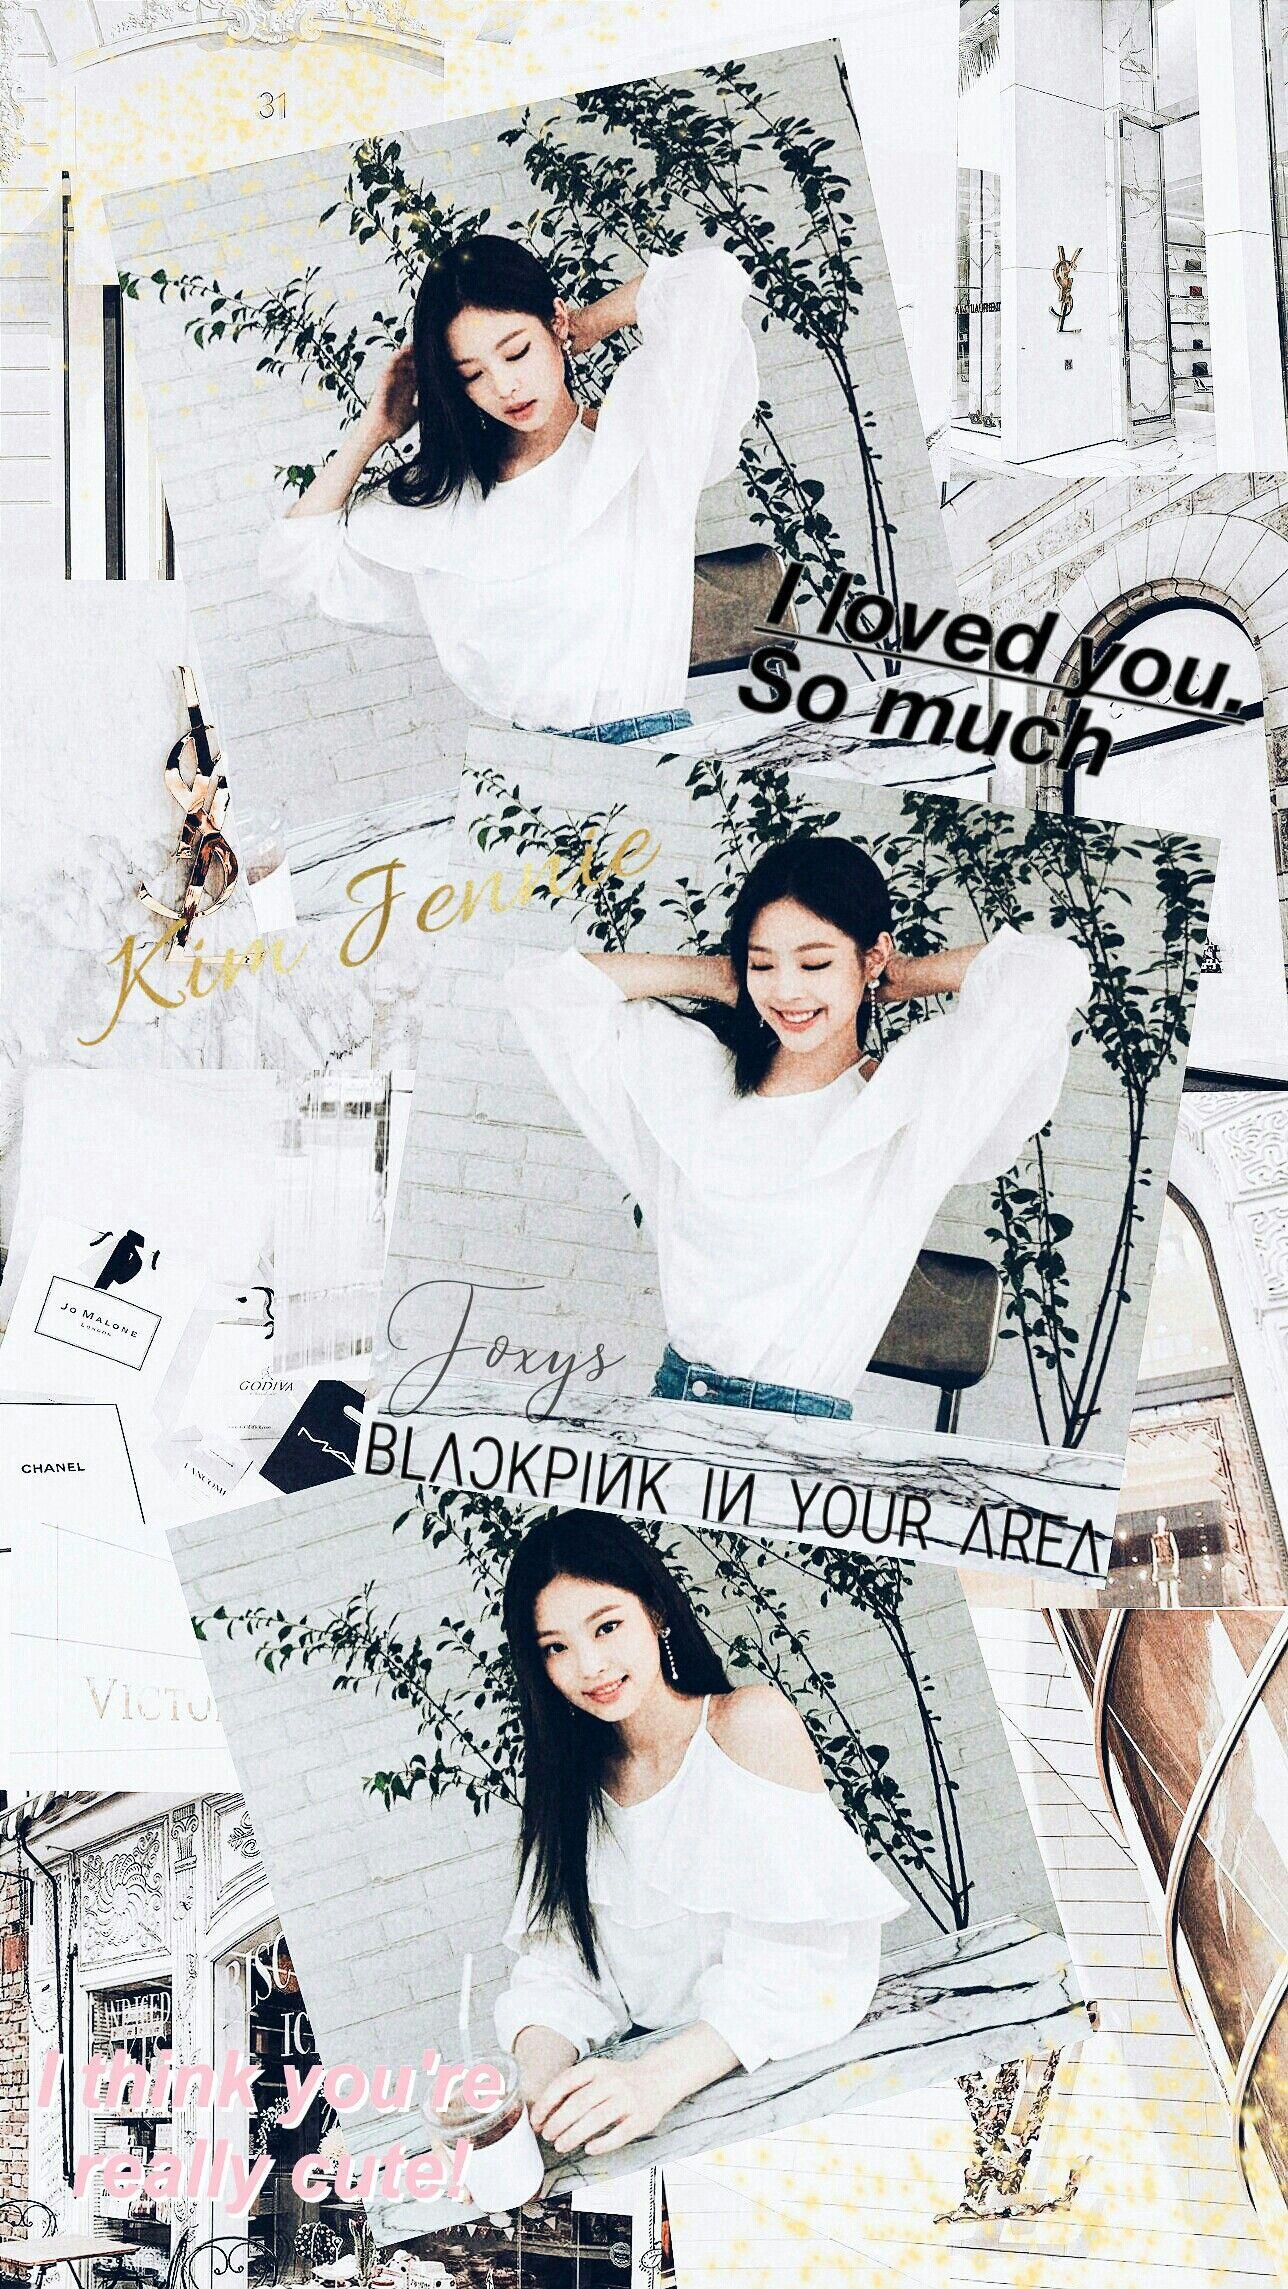 Jennie Blackpink Kim Jennie Jennie Wallpaper Aesthetic Vsco Foxys Lisa Rose Jisoo Black Pink Kpop Gambar Selebritas Fotografi